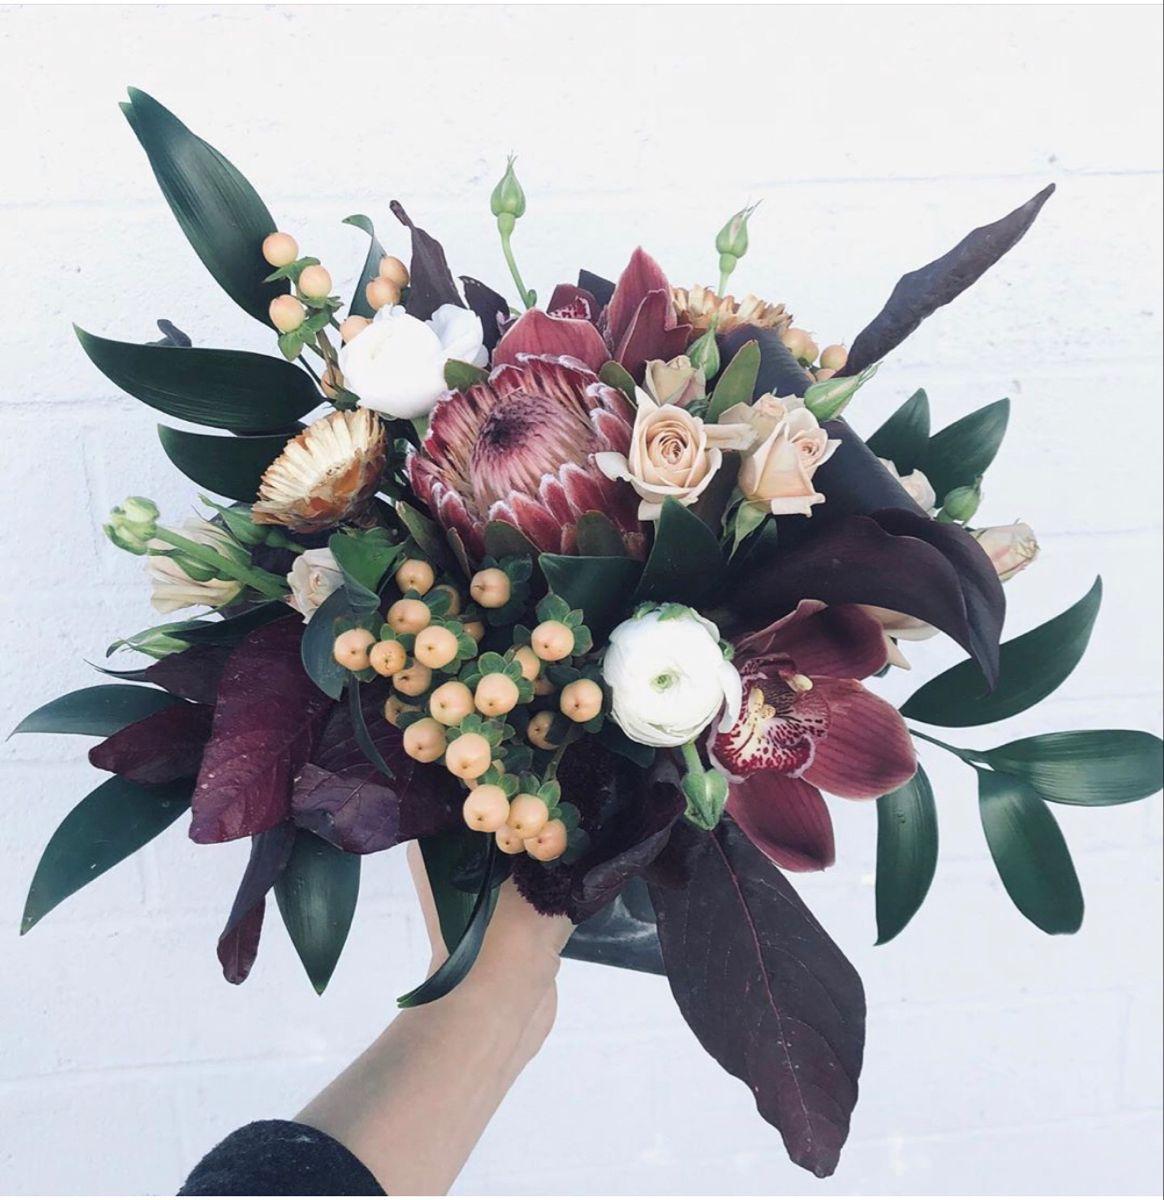 Burgundy Flowers In 2020 Burgundy Wedding Flowers Burgundy Flowers Purple Wedding Flowers